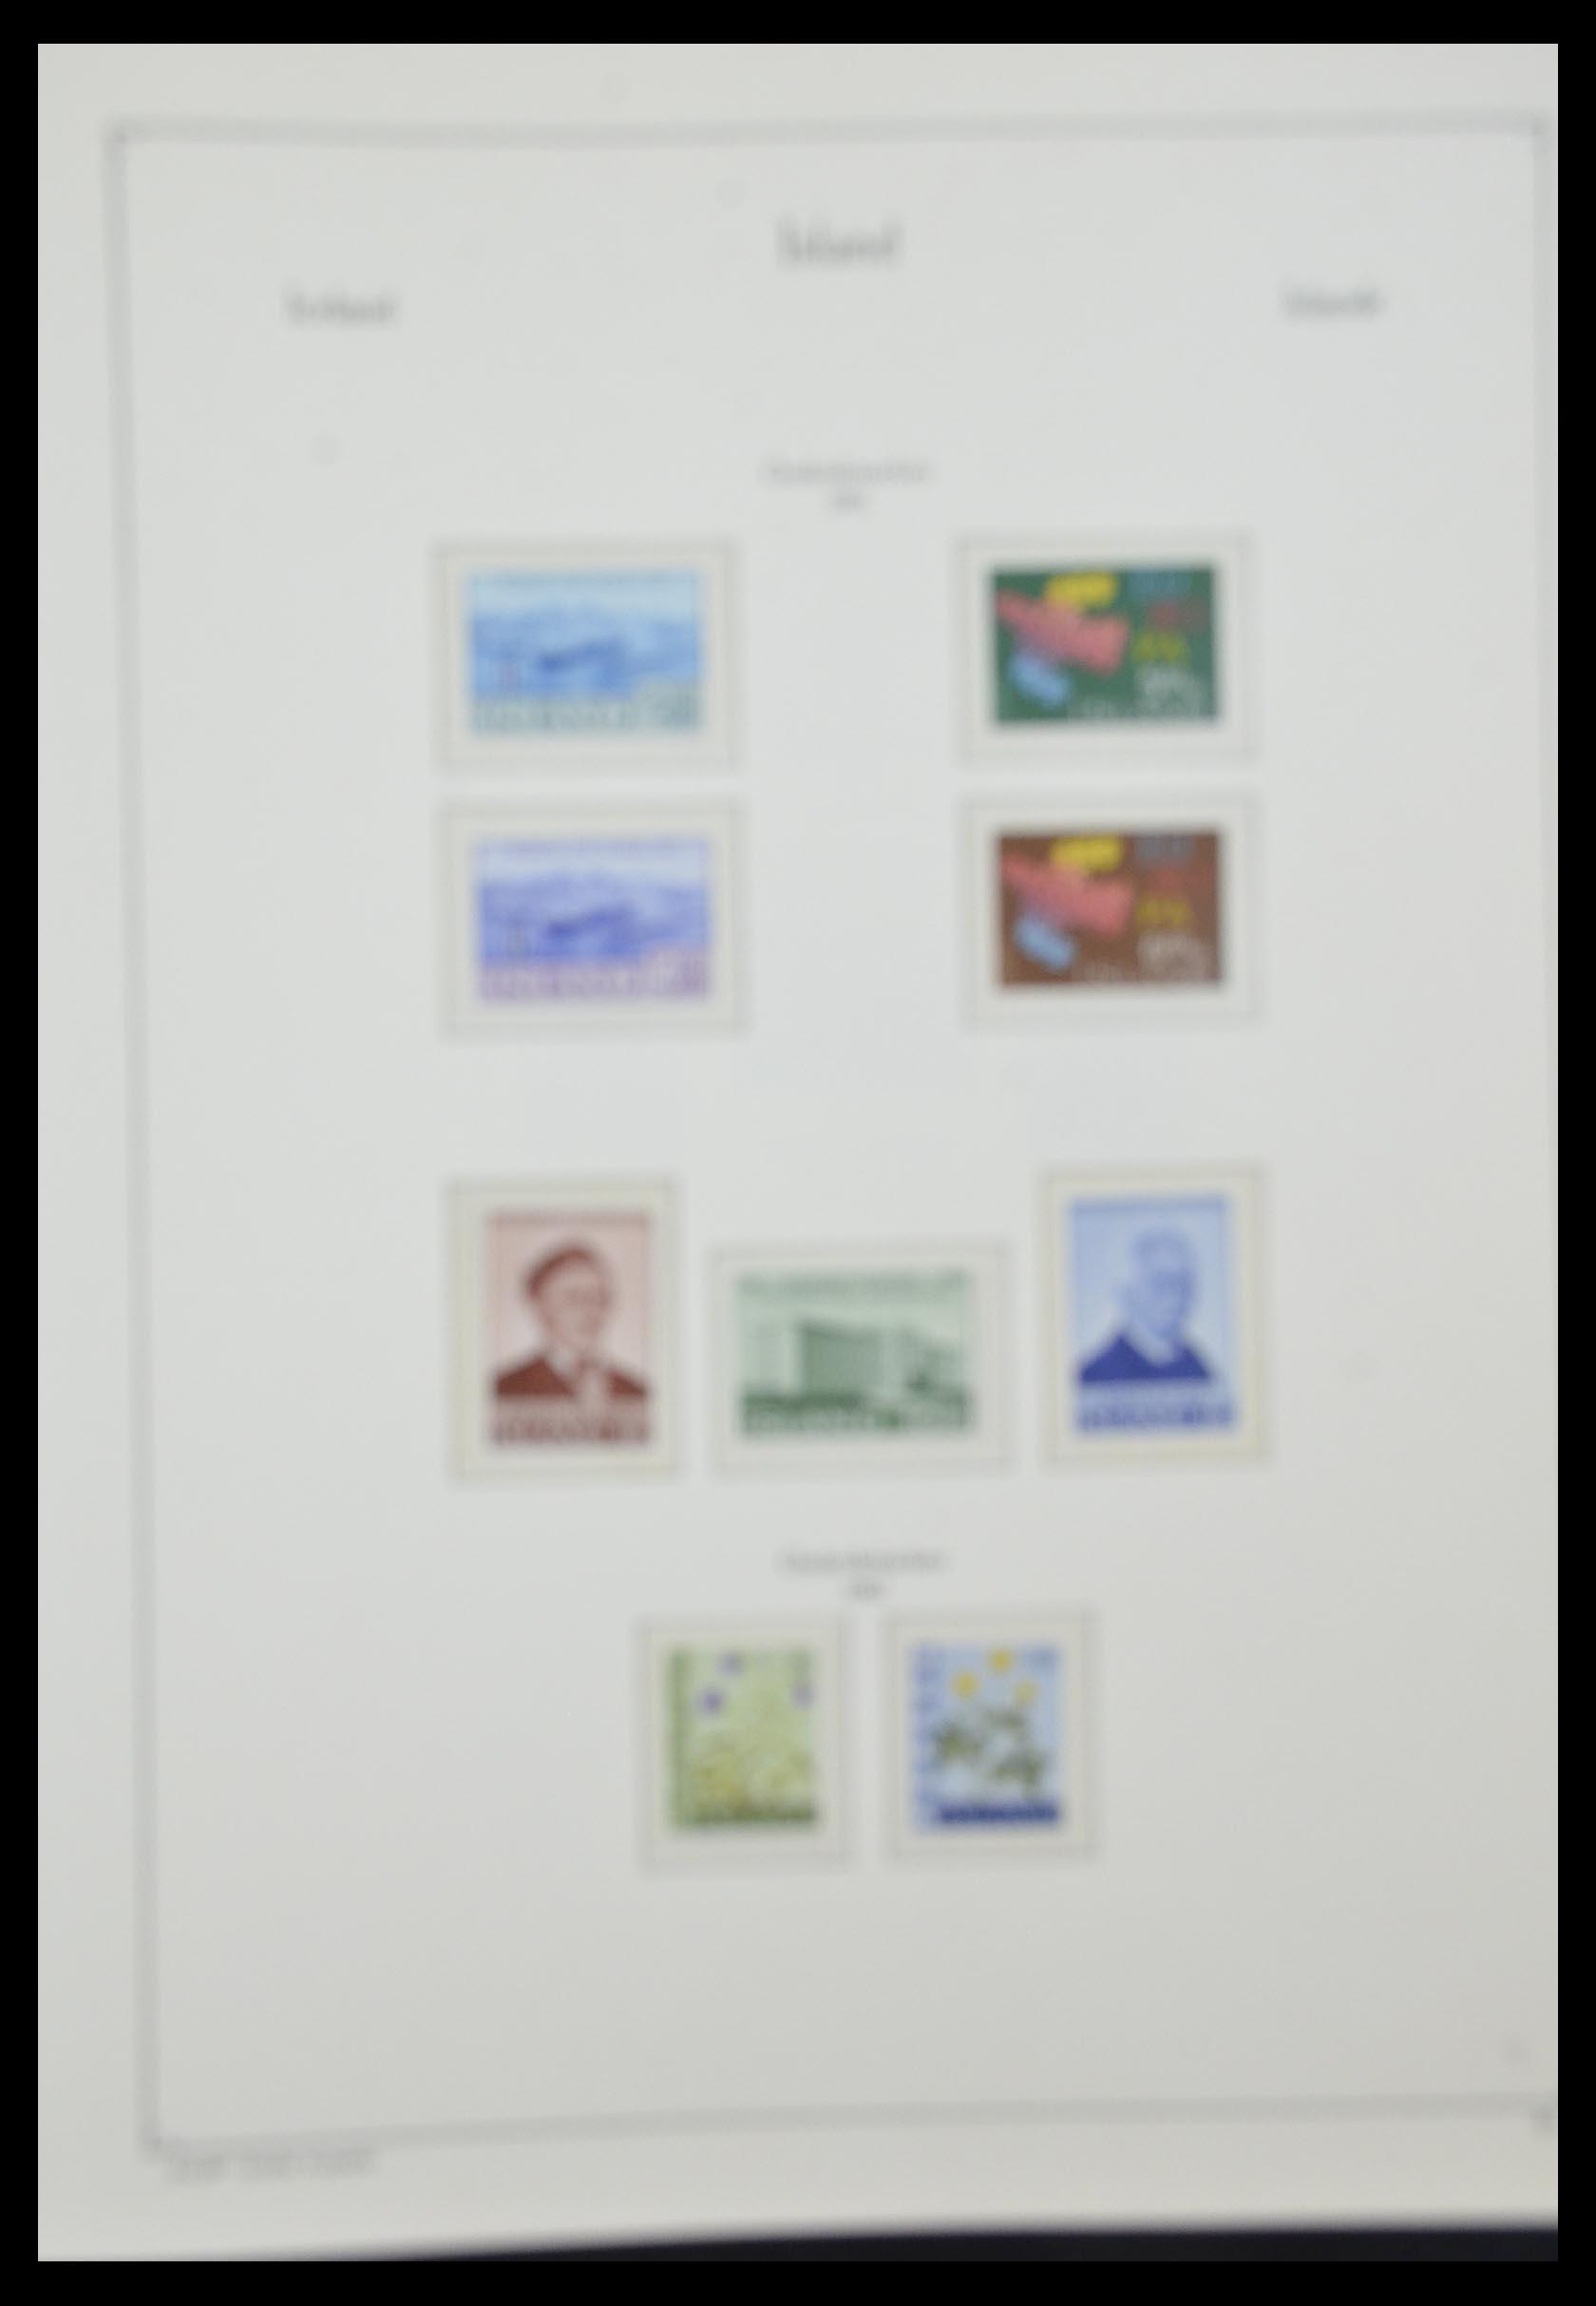 33185 013 - Postzegelverzameling 33184 Finland 1856-1990.